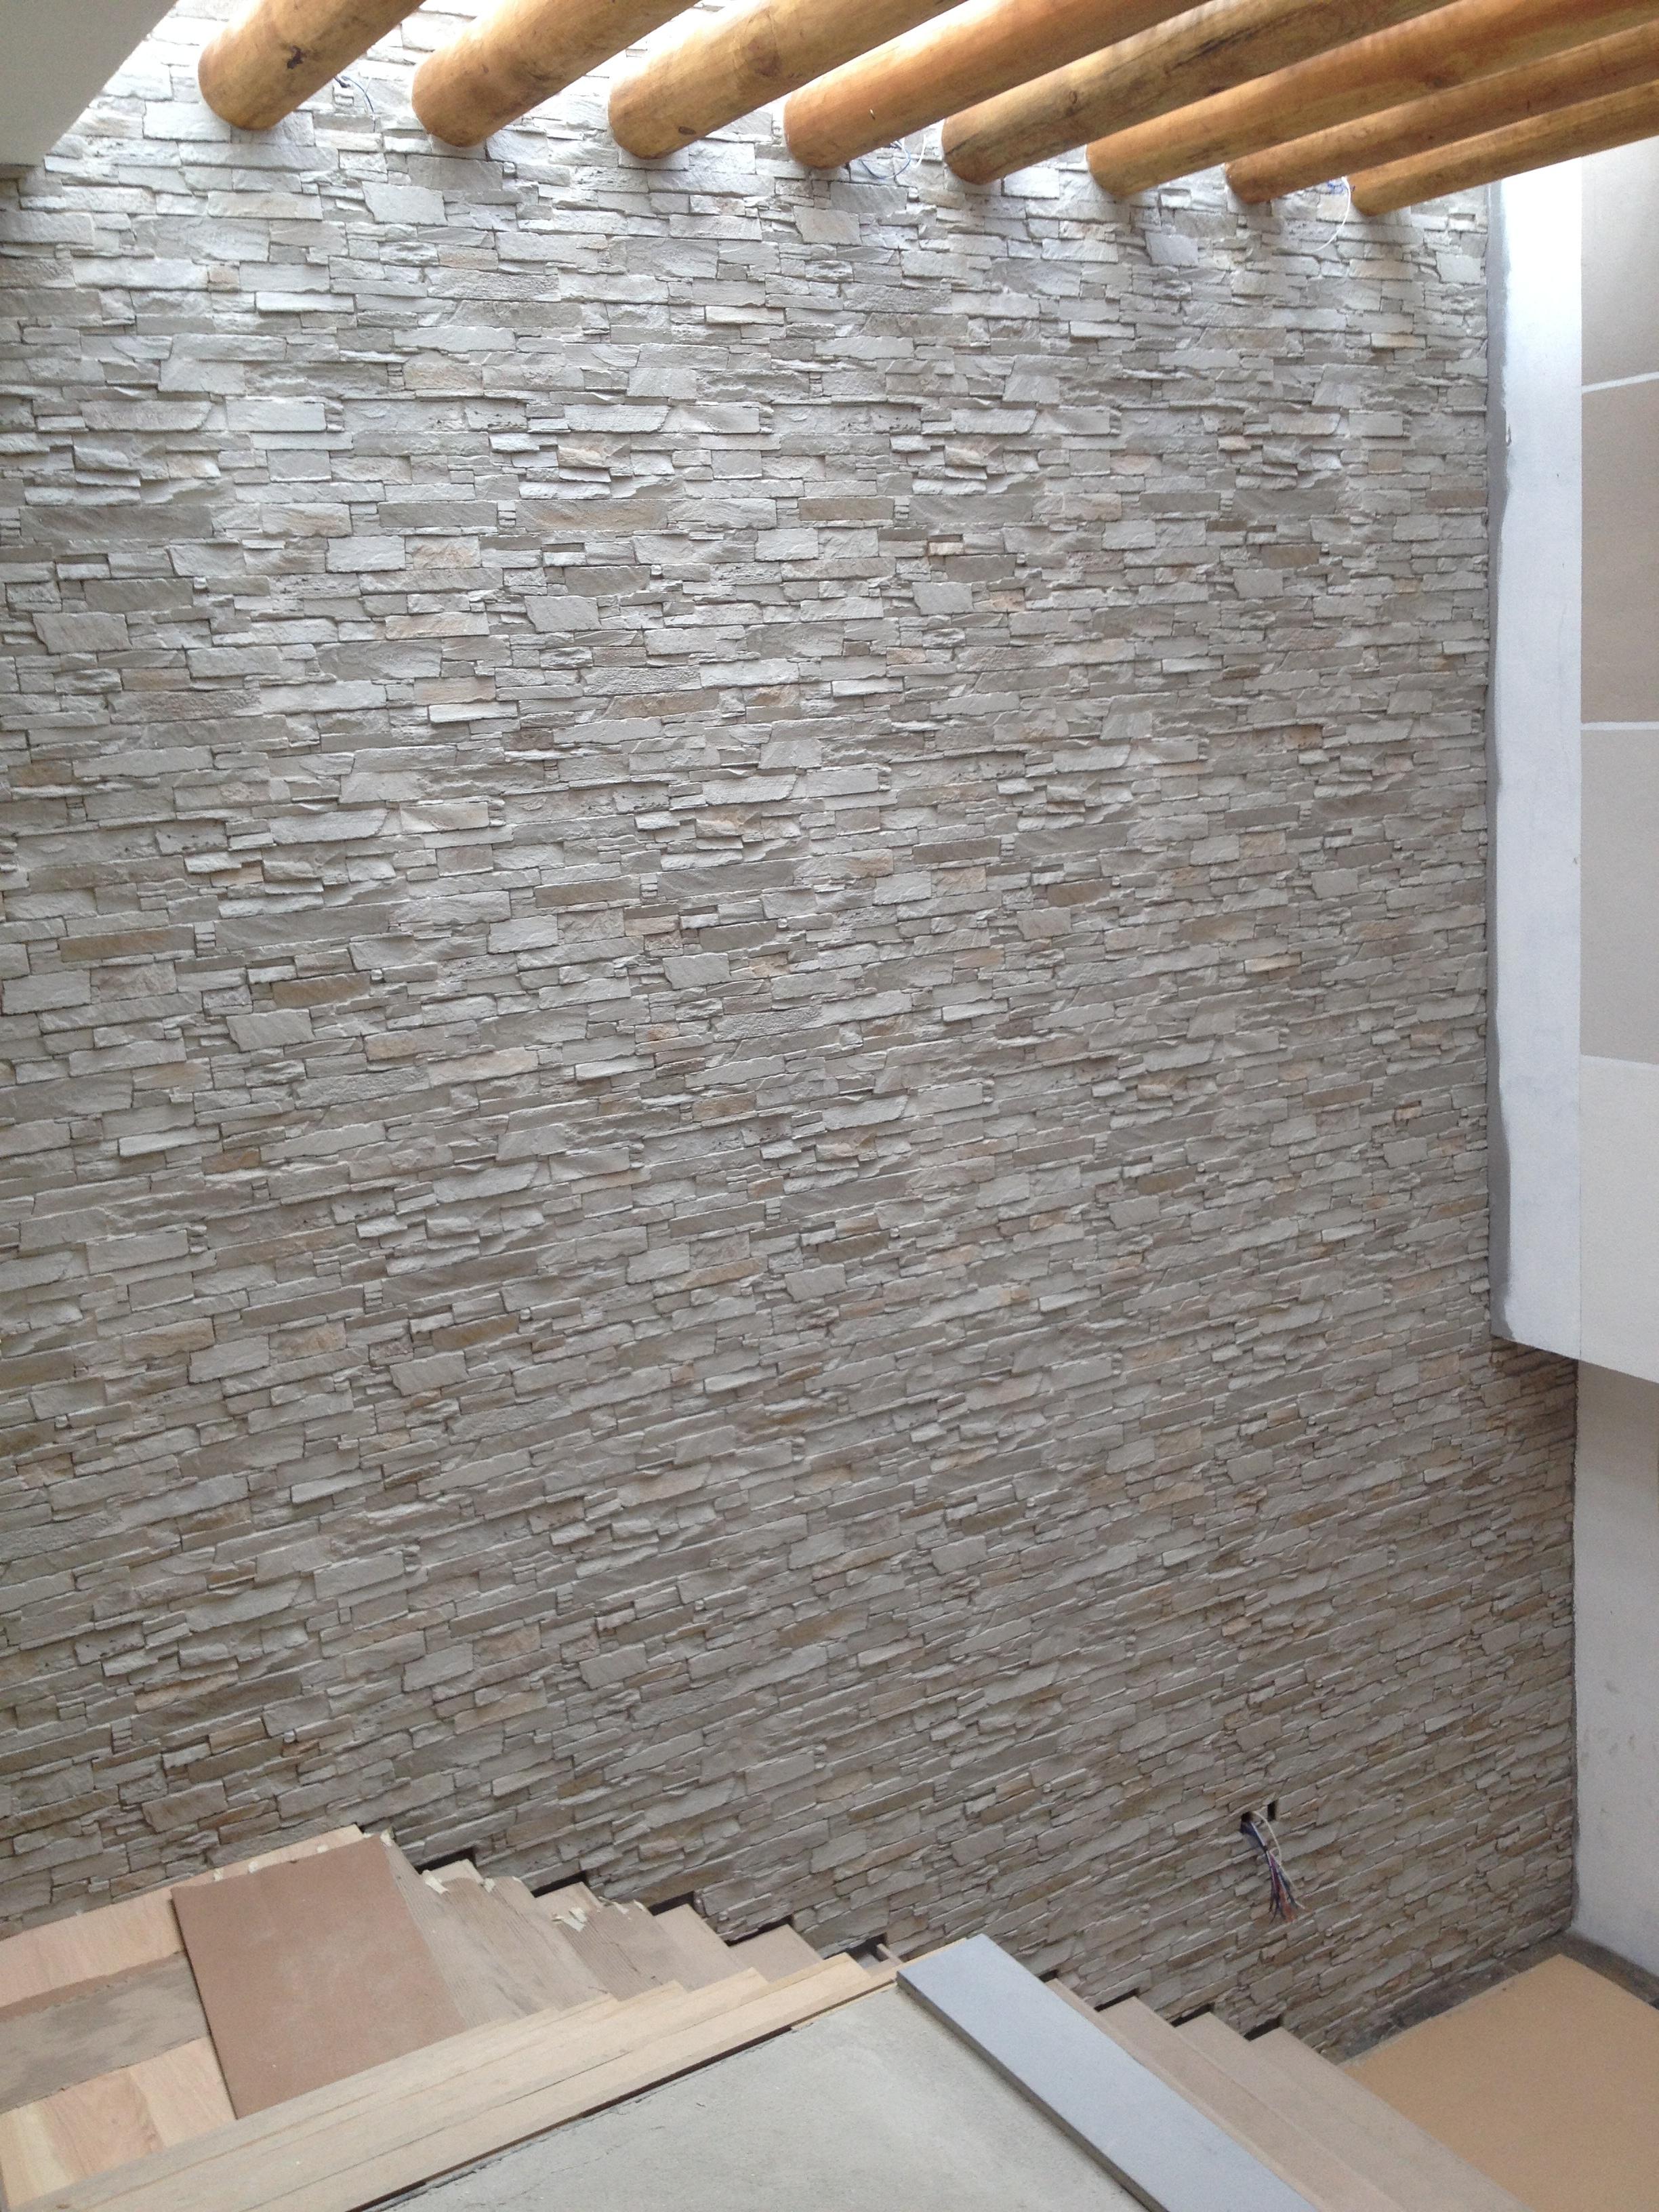 Panel piedra andes blanco arena panel piedra paneles de piedra paneles decorativos - Paneles decorativos poliuretano ...